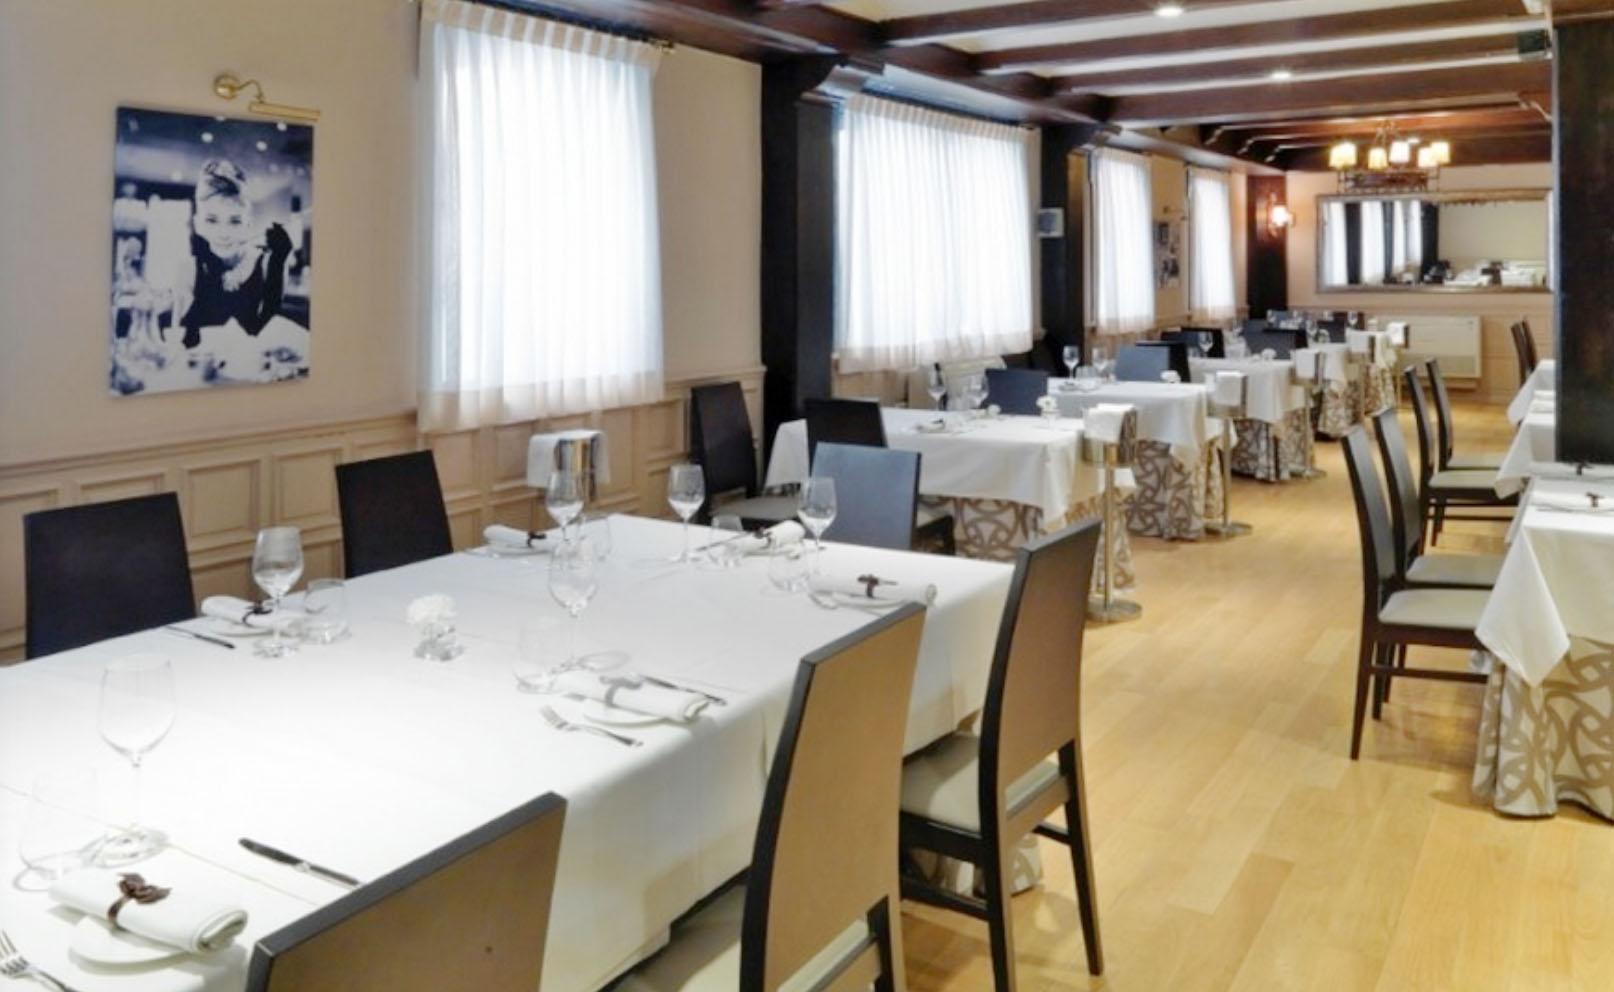 mejores restaurantes románticos Madrid - Atelier Belge